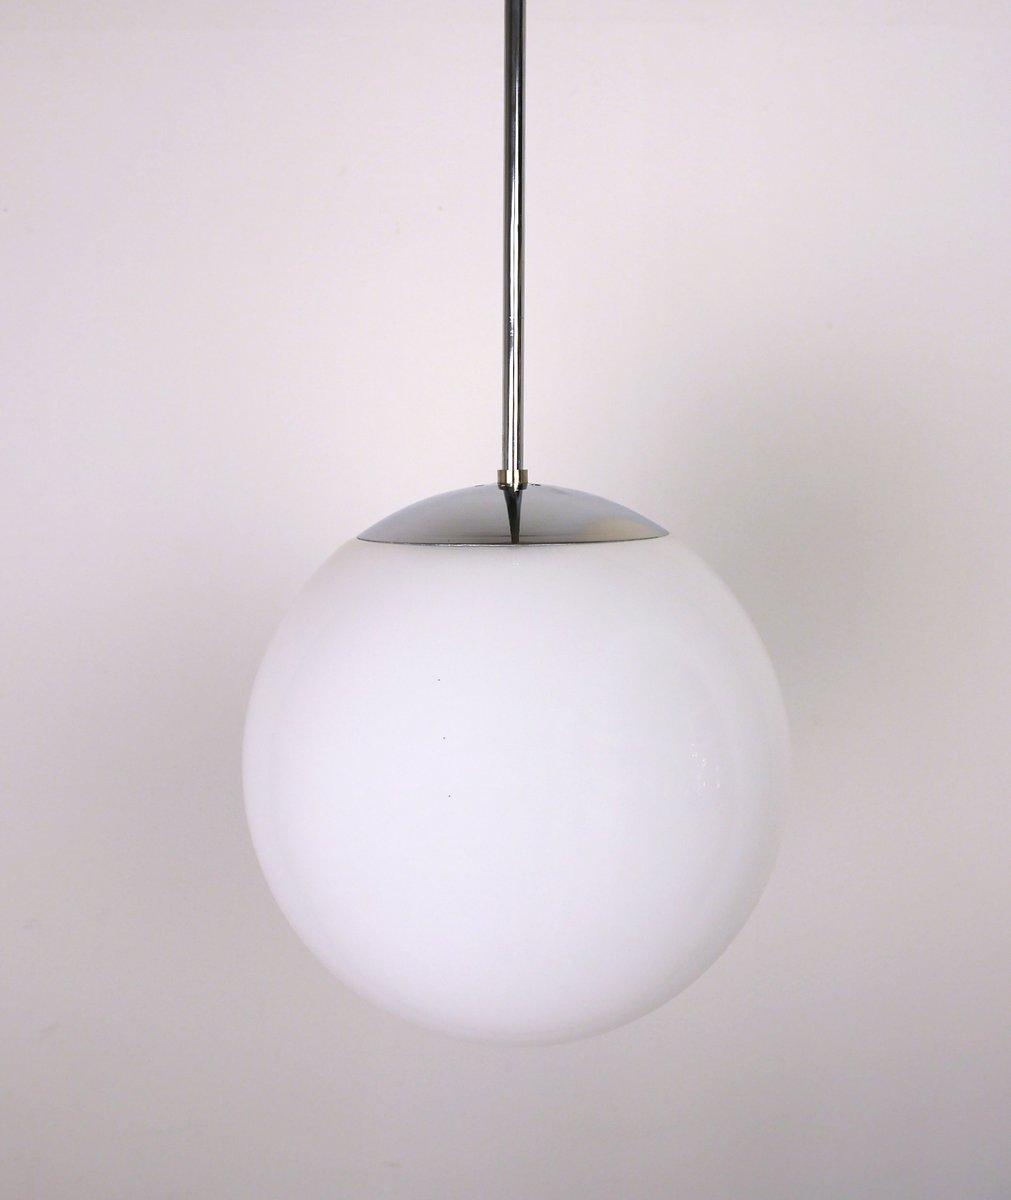 woodford beleuchtung wohnwand arona lampen leuchten innenleuchten m belleuchten h ffner. Black Bedroom Furniture Sets. Home Design Ideas